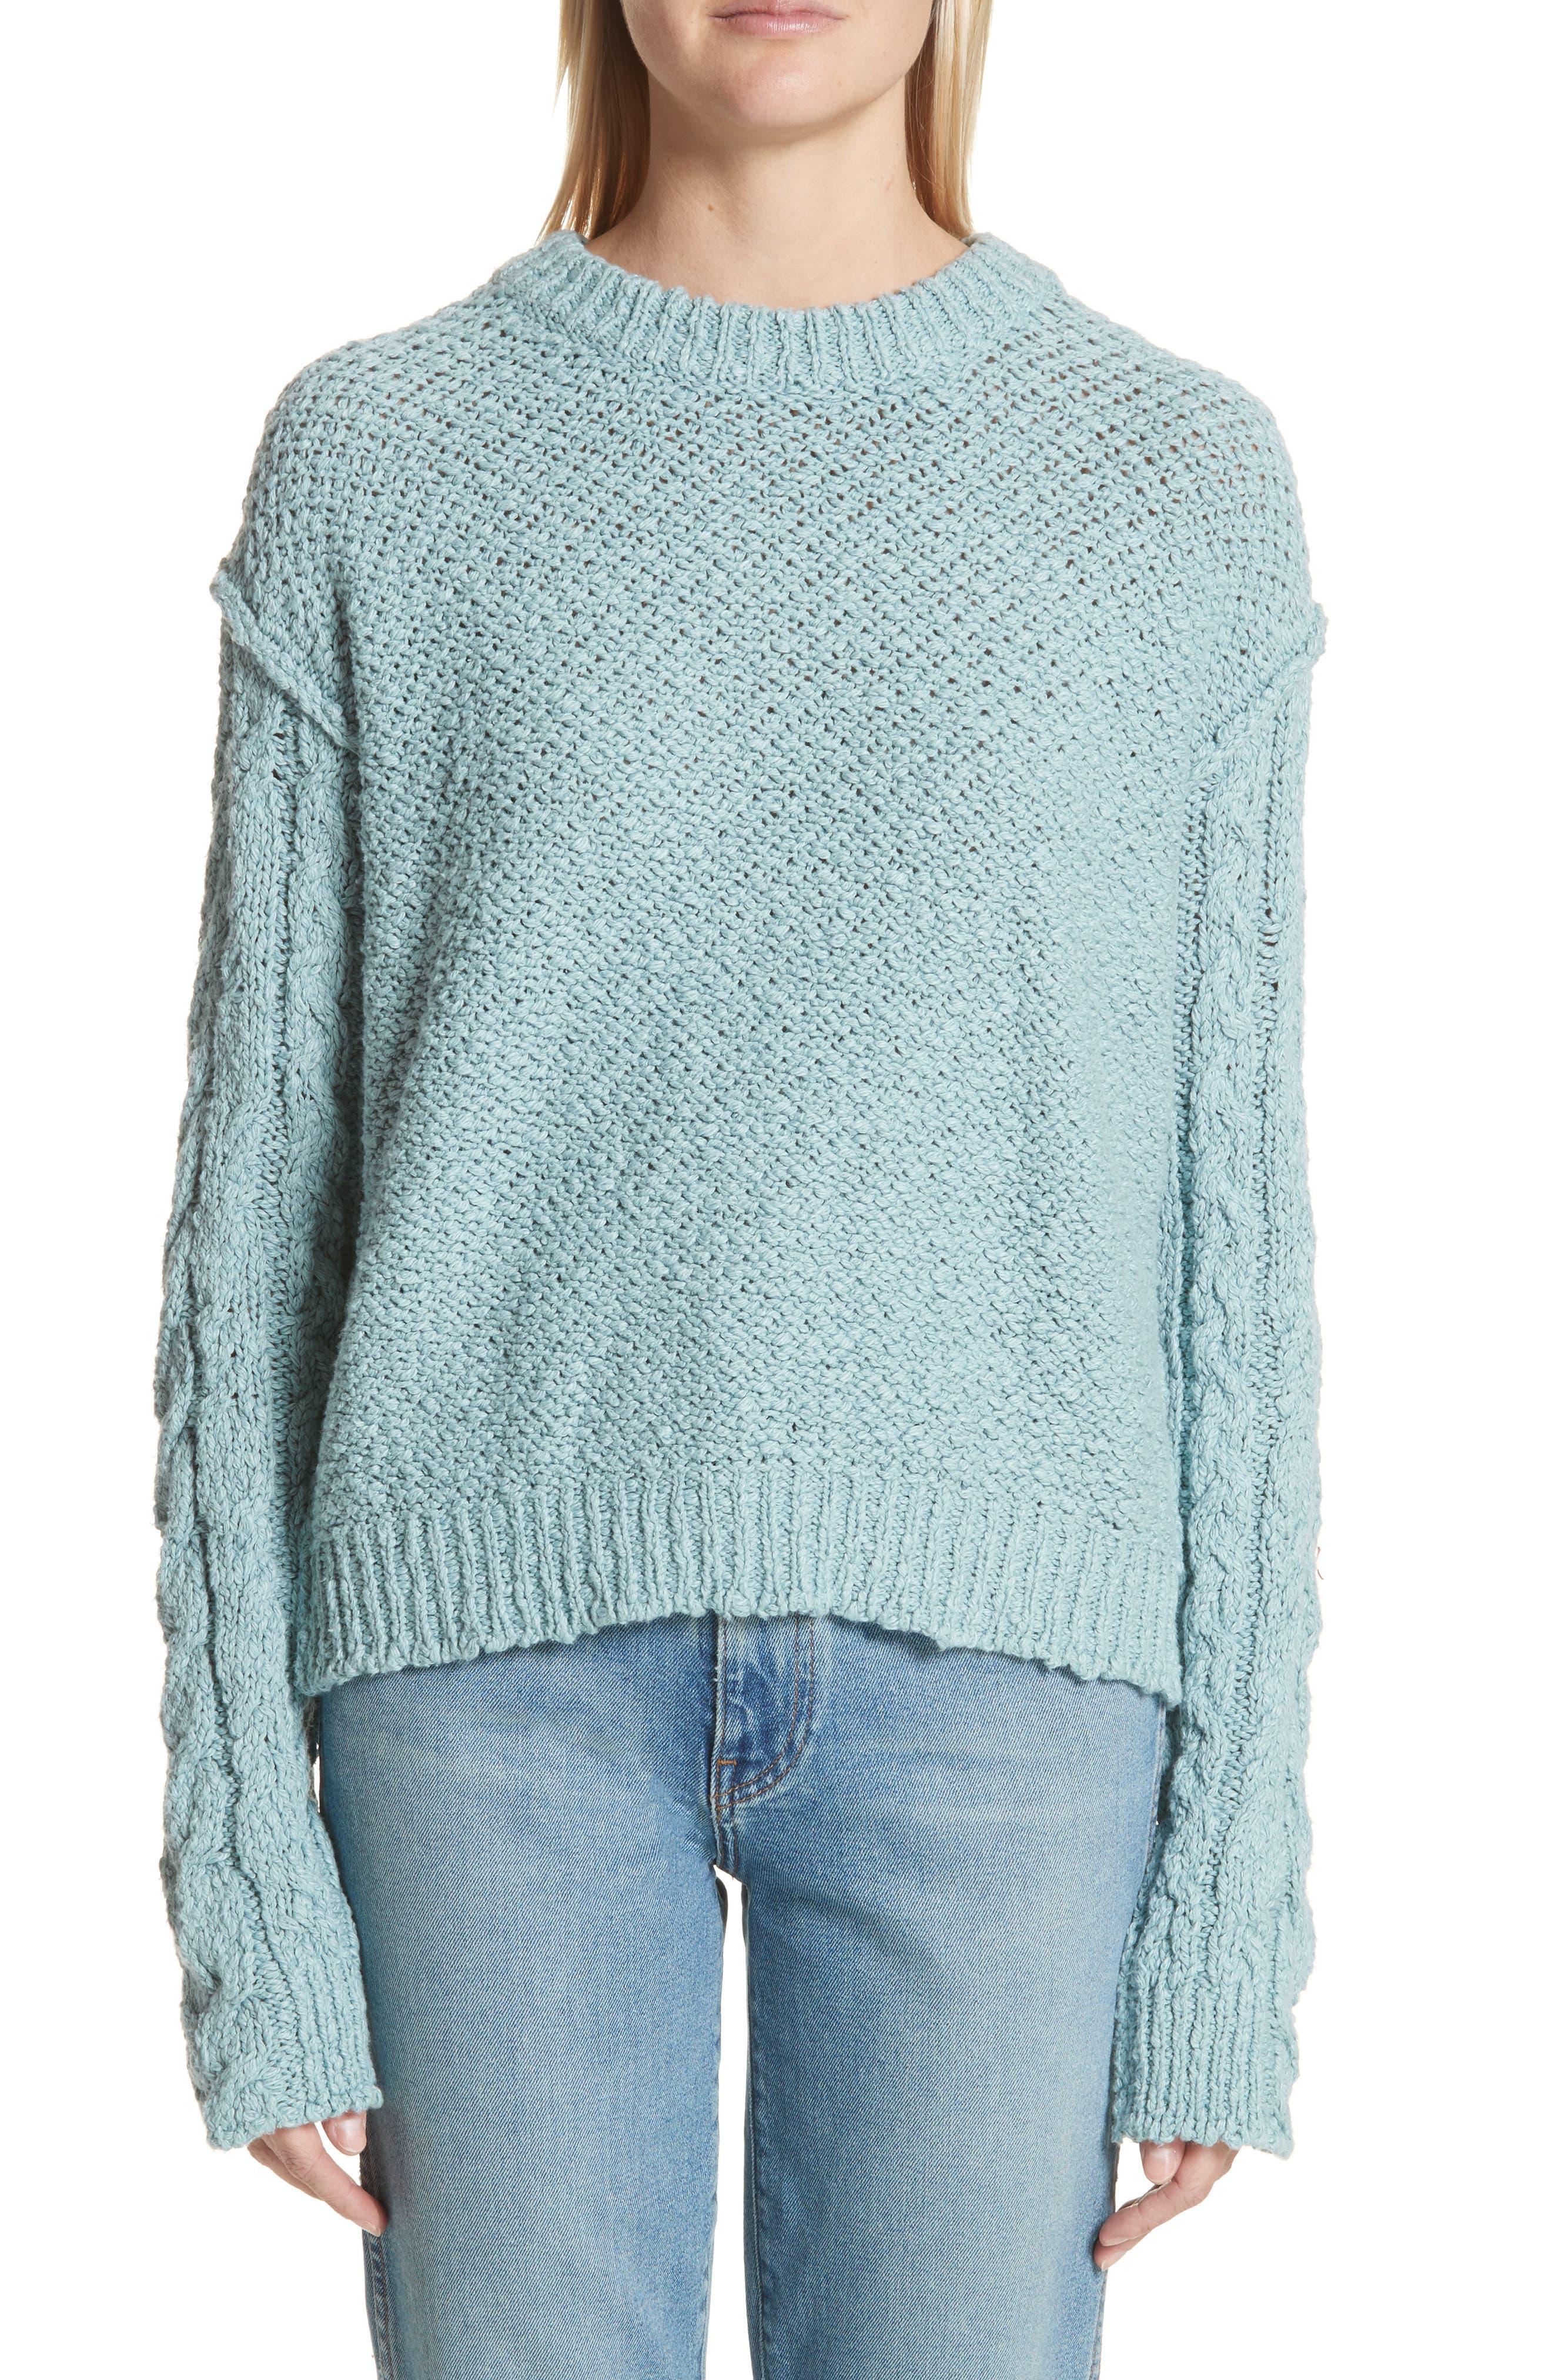 Hila Cable Sleeve Sweater,                         Main,                         color, 400